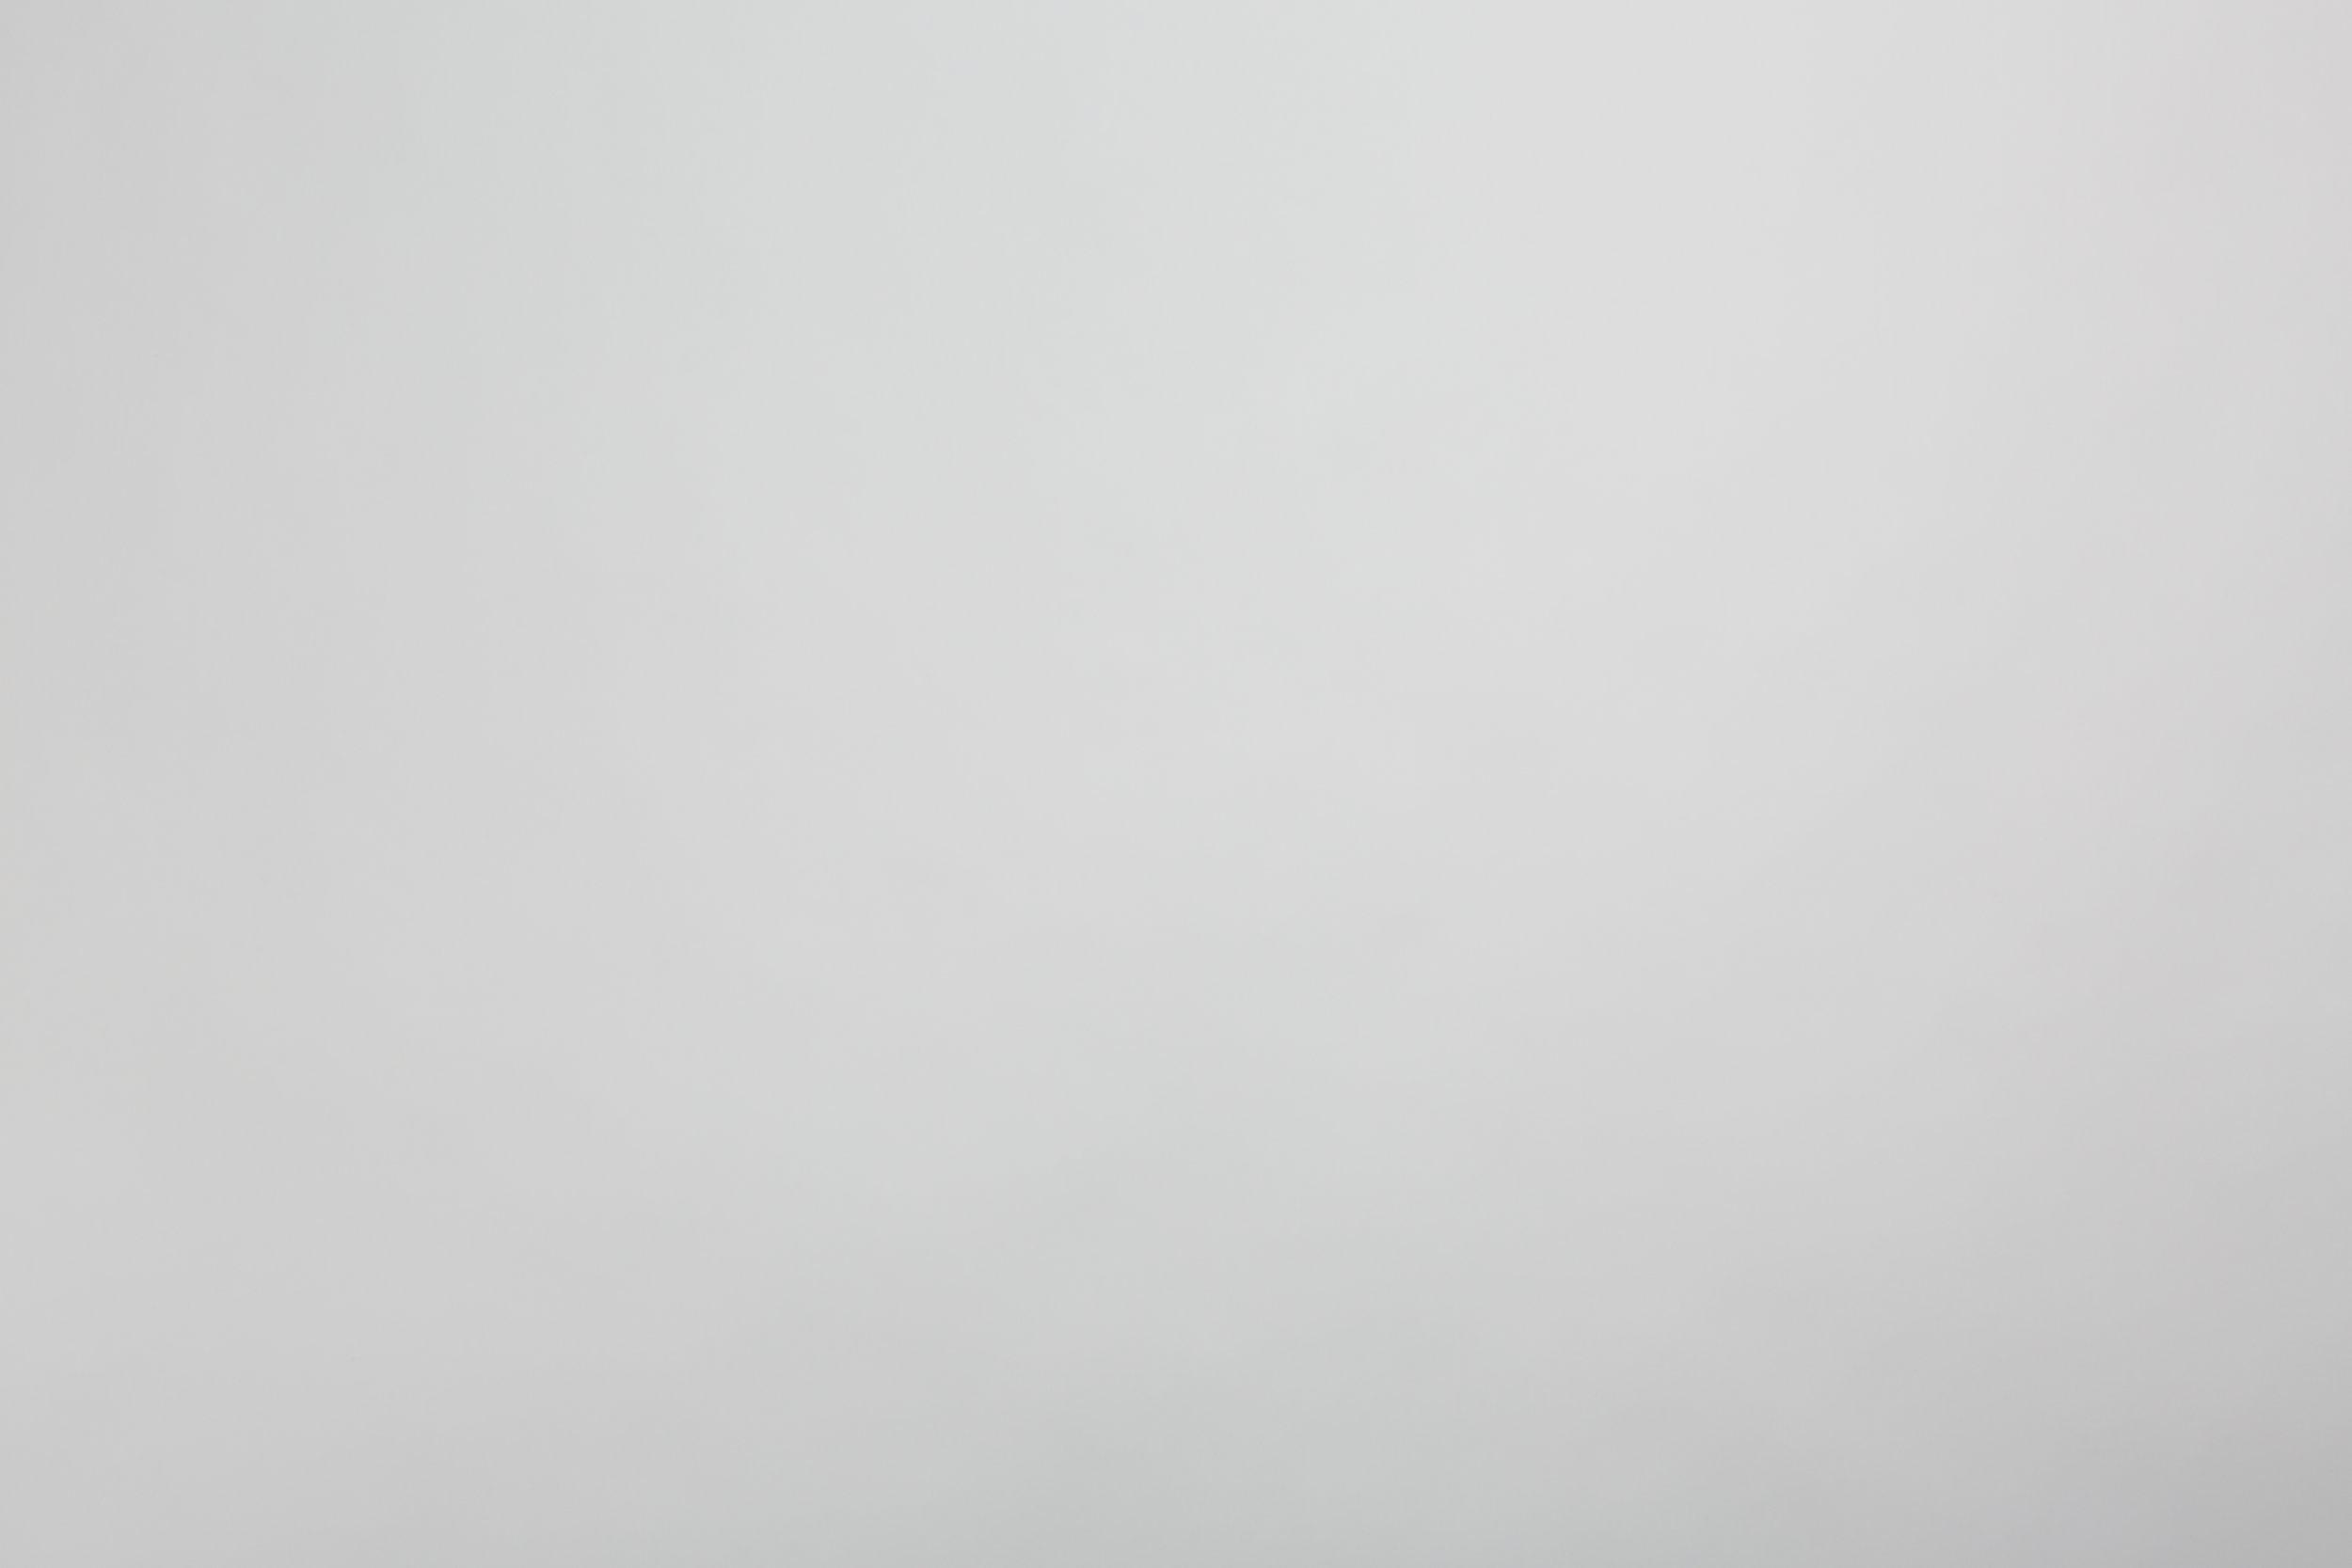 White / Light Grey Background